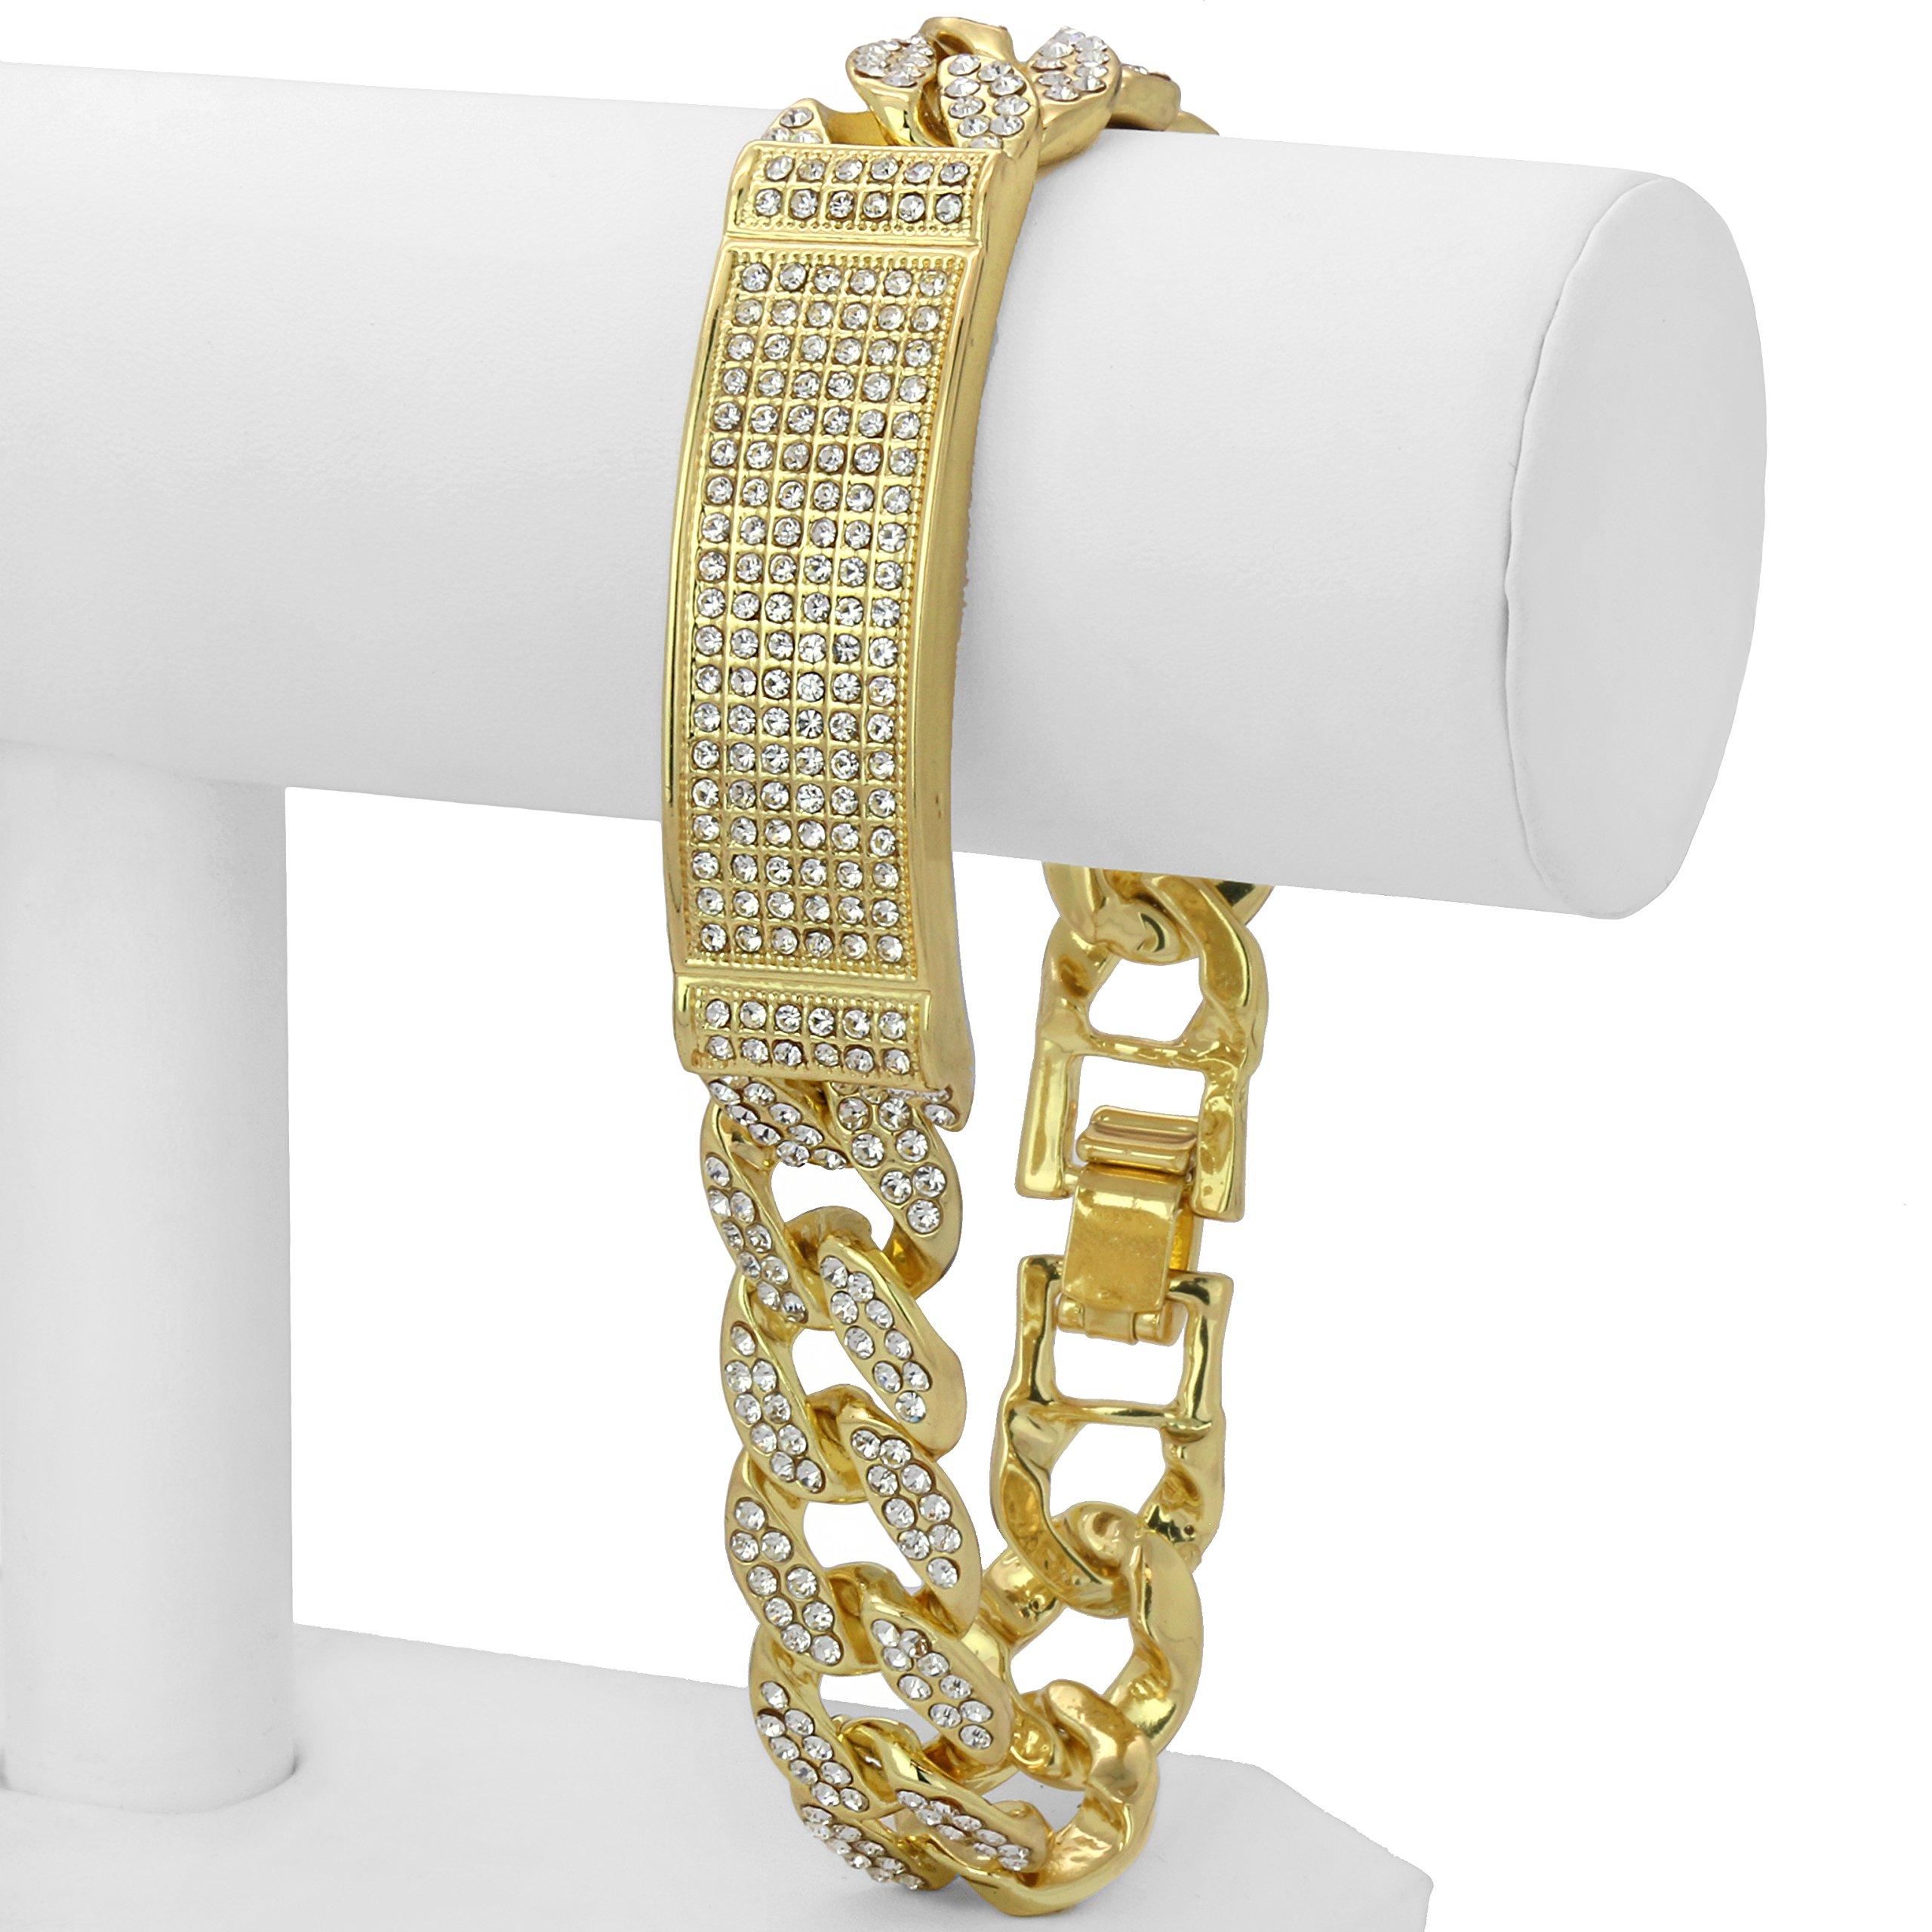 L & L Nation Gold Tone CUBAN Link ID Iced Out Clear Cz Stones Hip Hop Bracelet 9'' Inch PLUS Cz Earrings SET